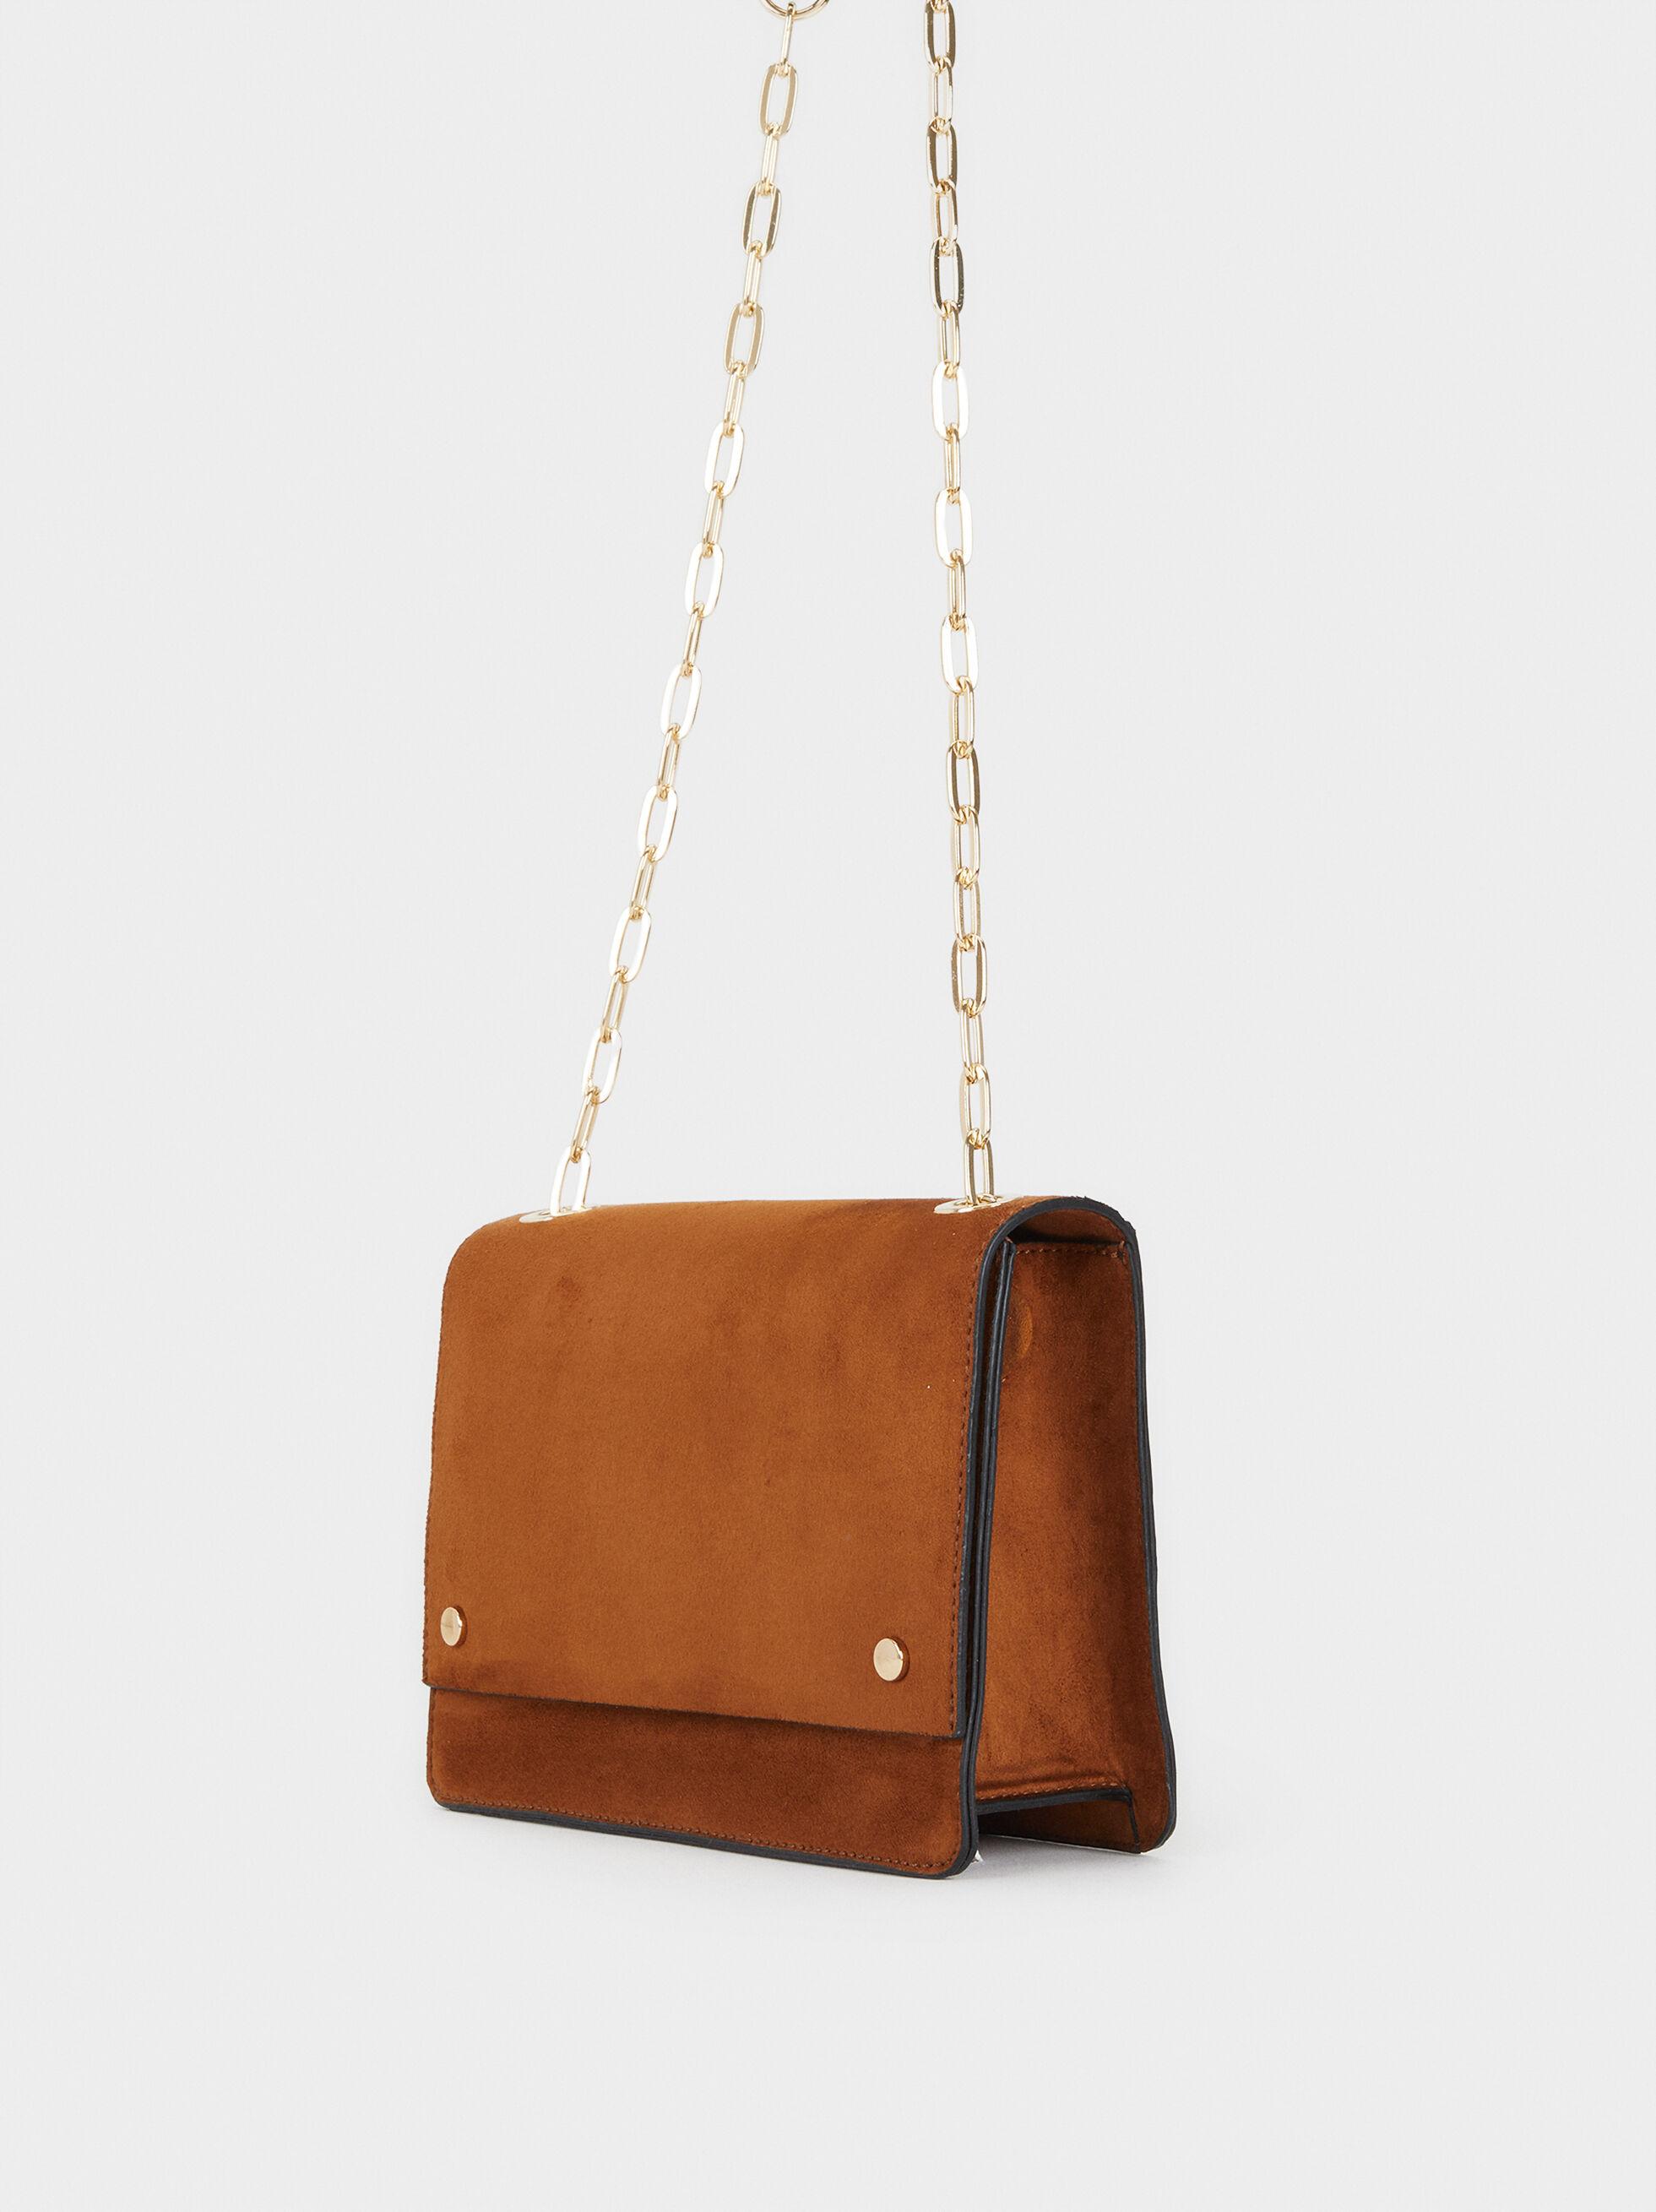 Faux Suede Crossbody Bag, Camel, hi-res